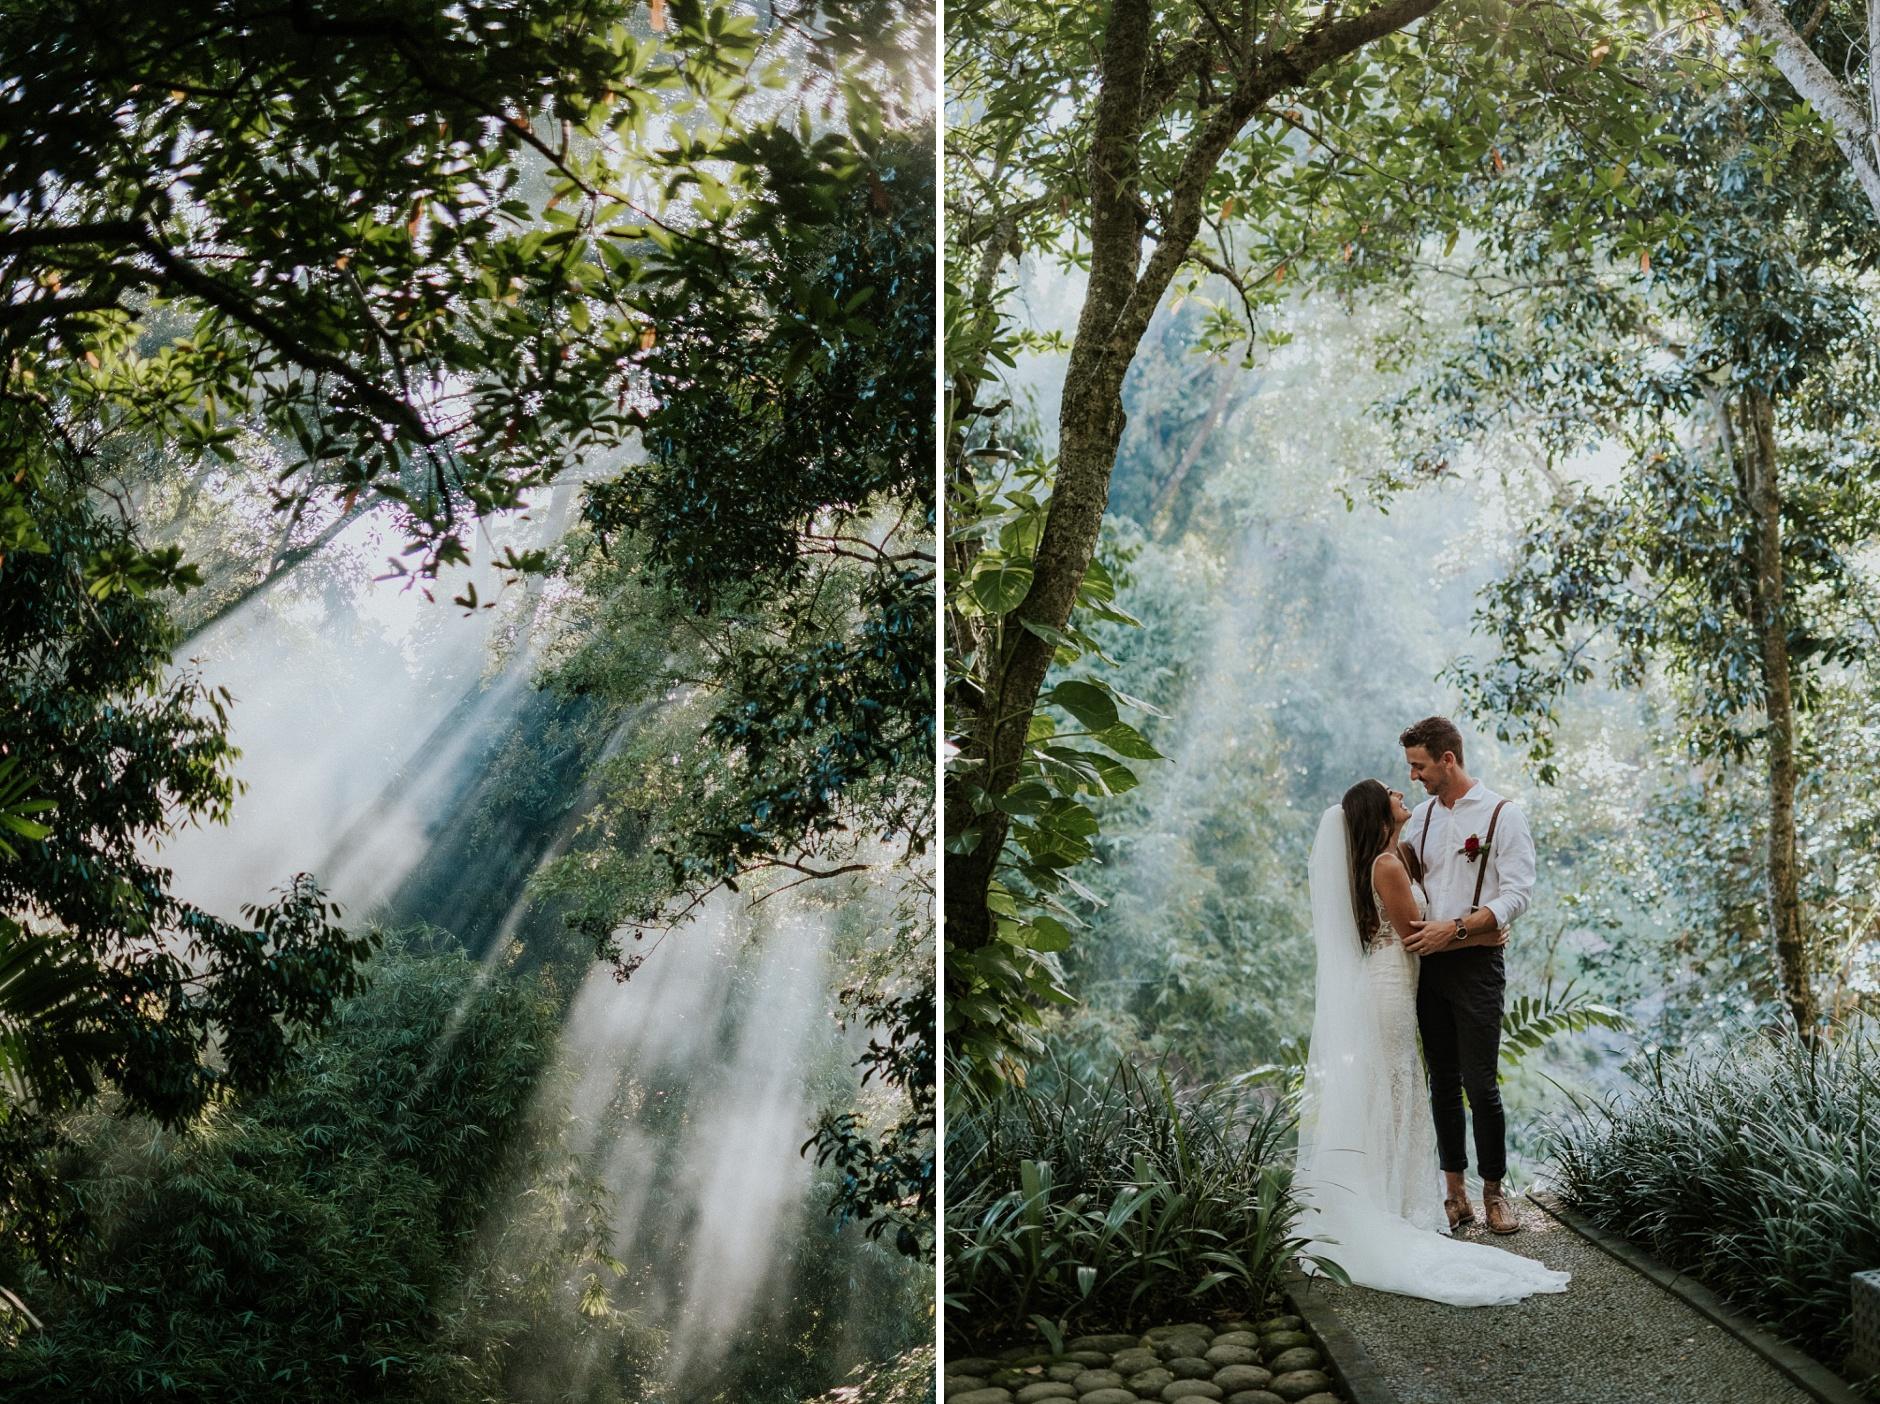 breanna&dan0406a_Bali-Wedding-Photographer.jpg